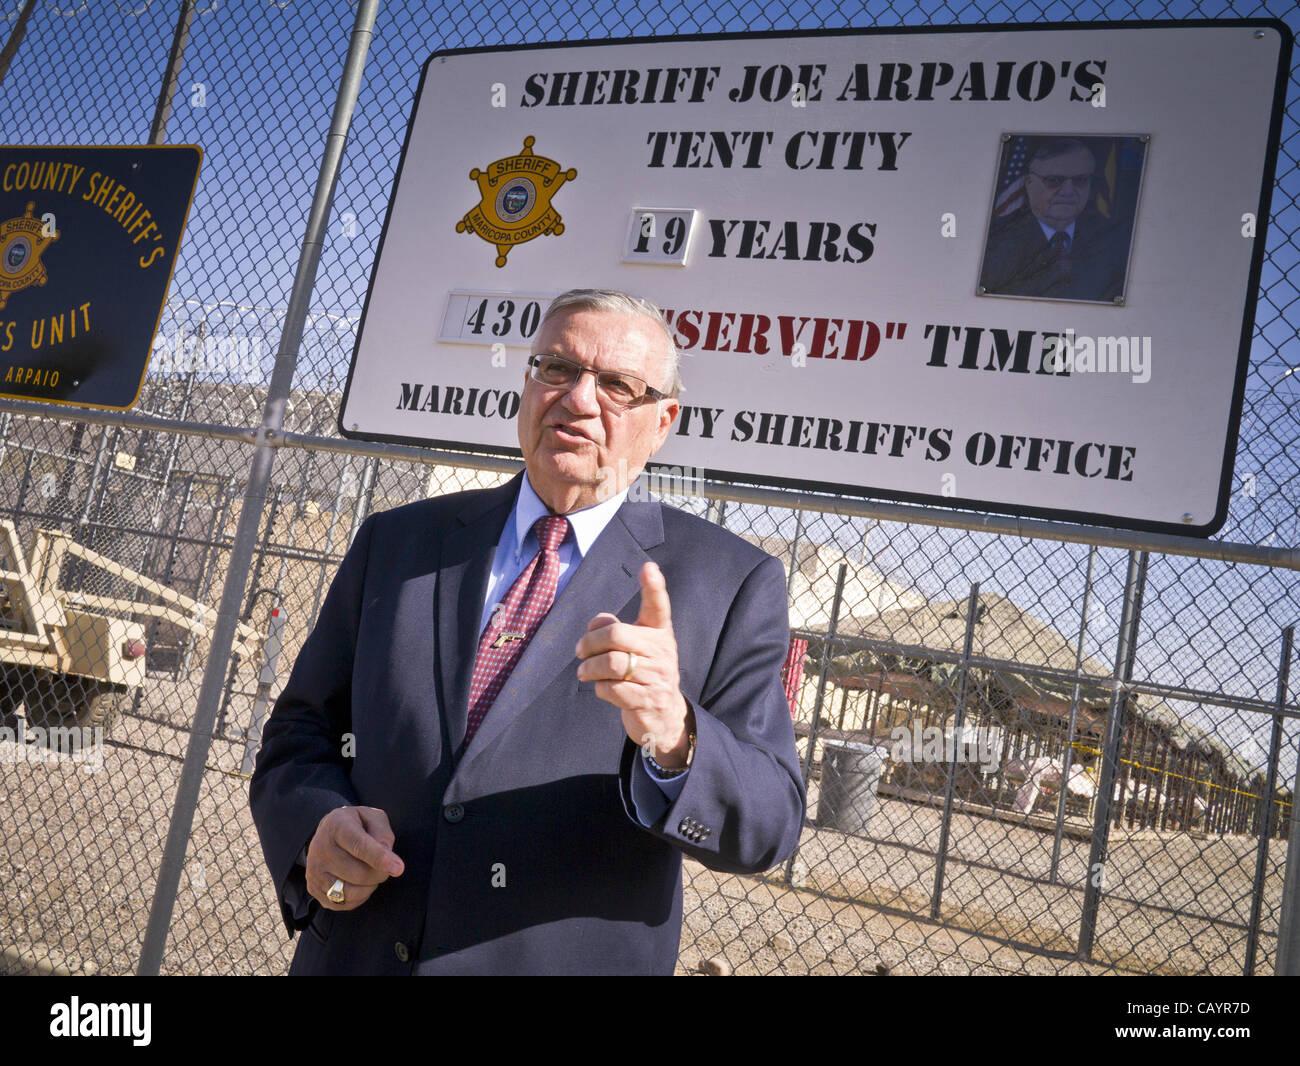 Sheriff Joe Arpaio Imágenes De Stock & Sheriff Joe Arpaio Fotos De ...